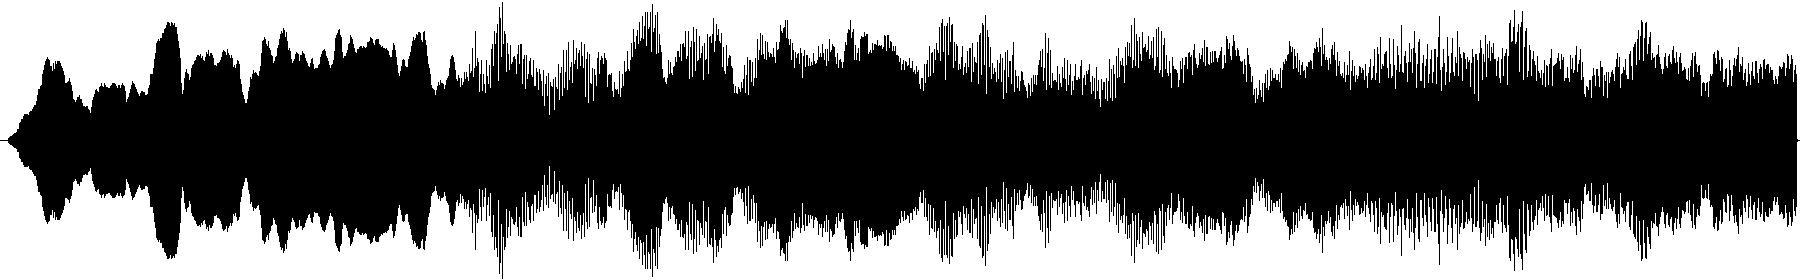 lofiloopviolinlowpitch